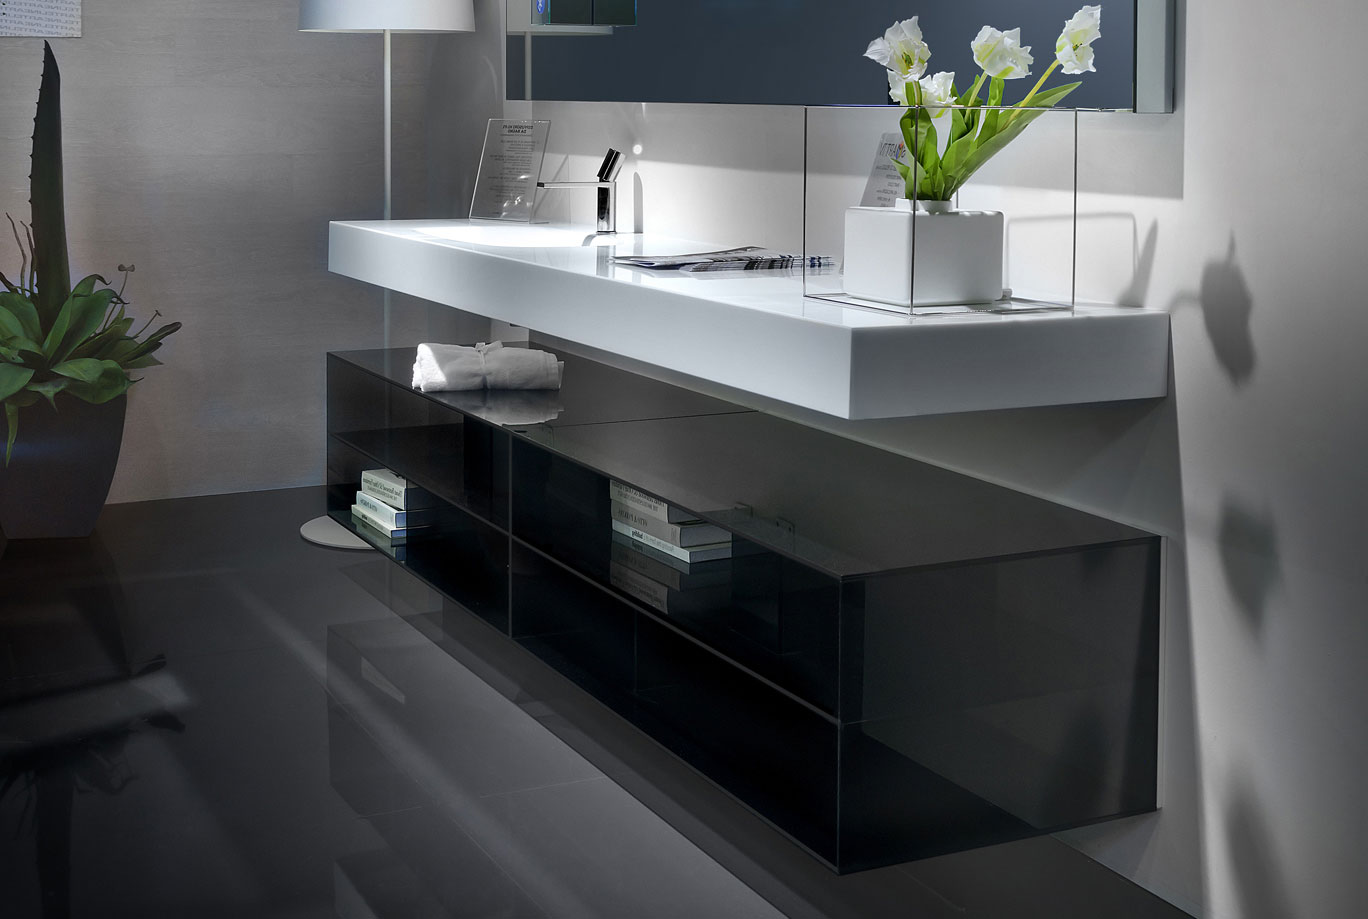 Frammento - Info - Bagno, Design, Arredobagno, Arredamento bagno ...